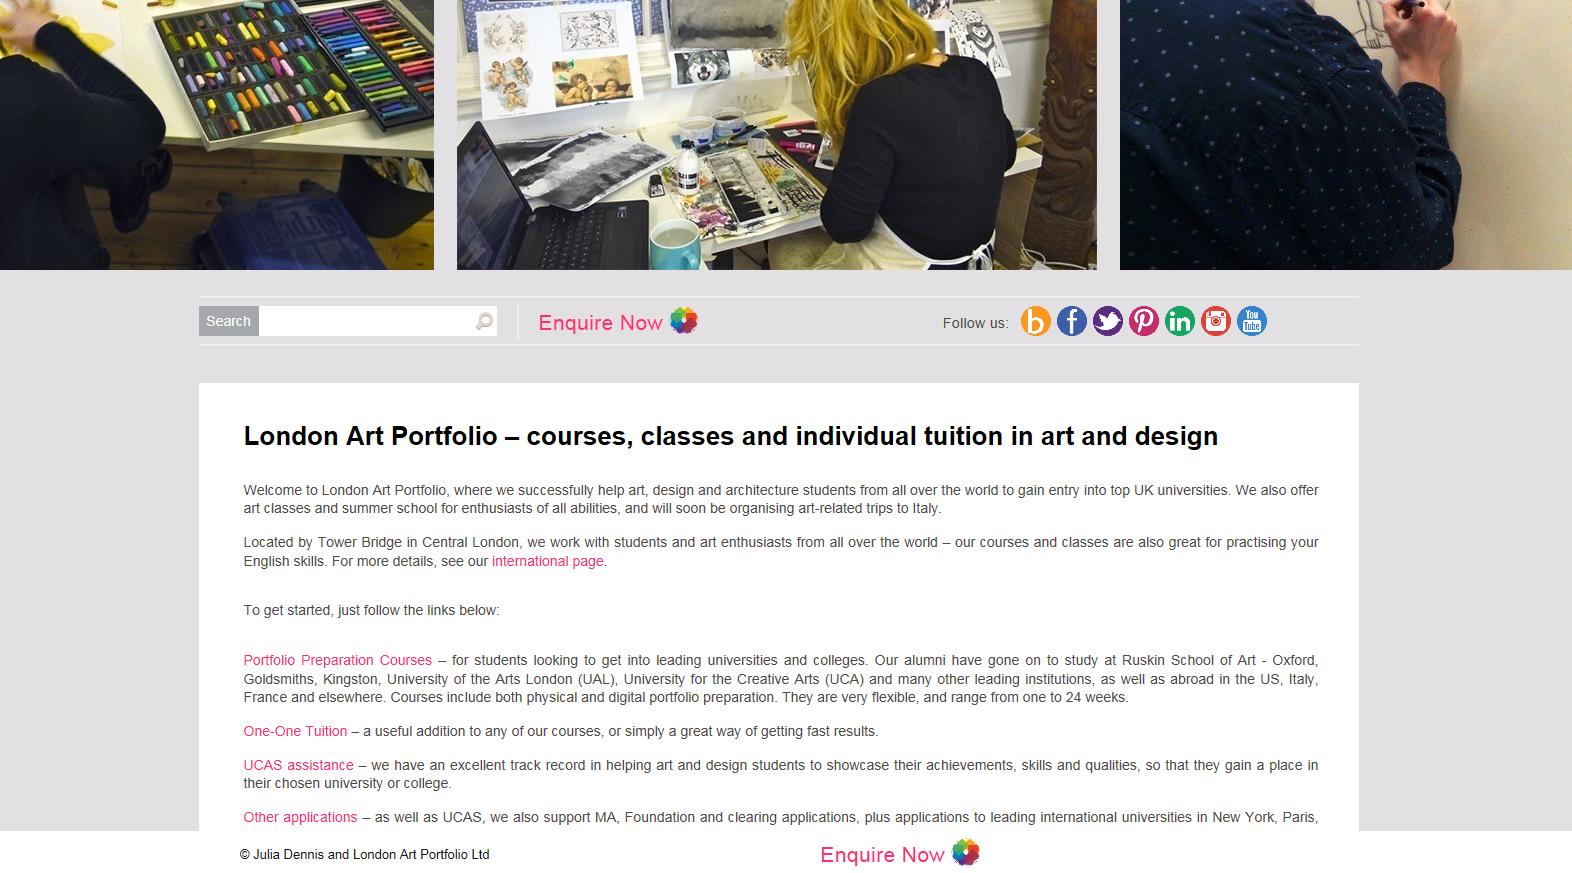 London Art Portfolio website